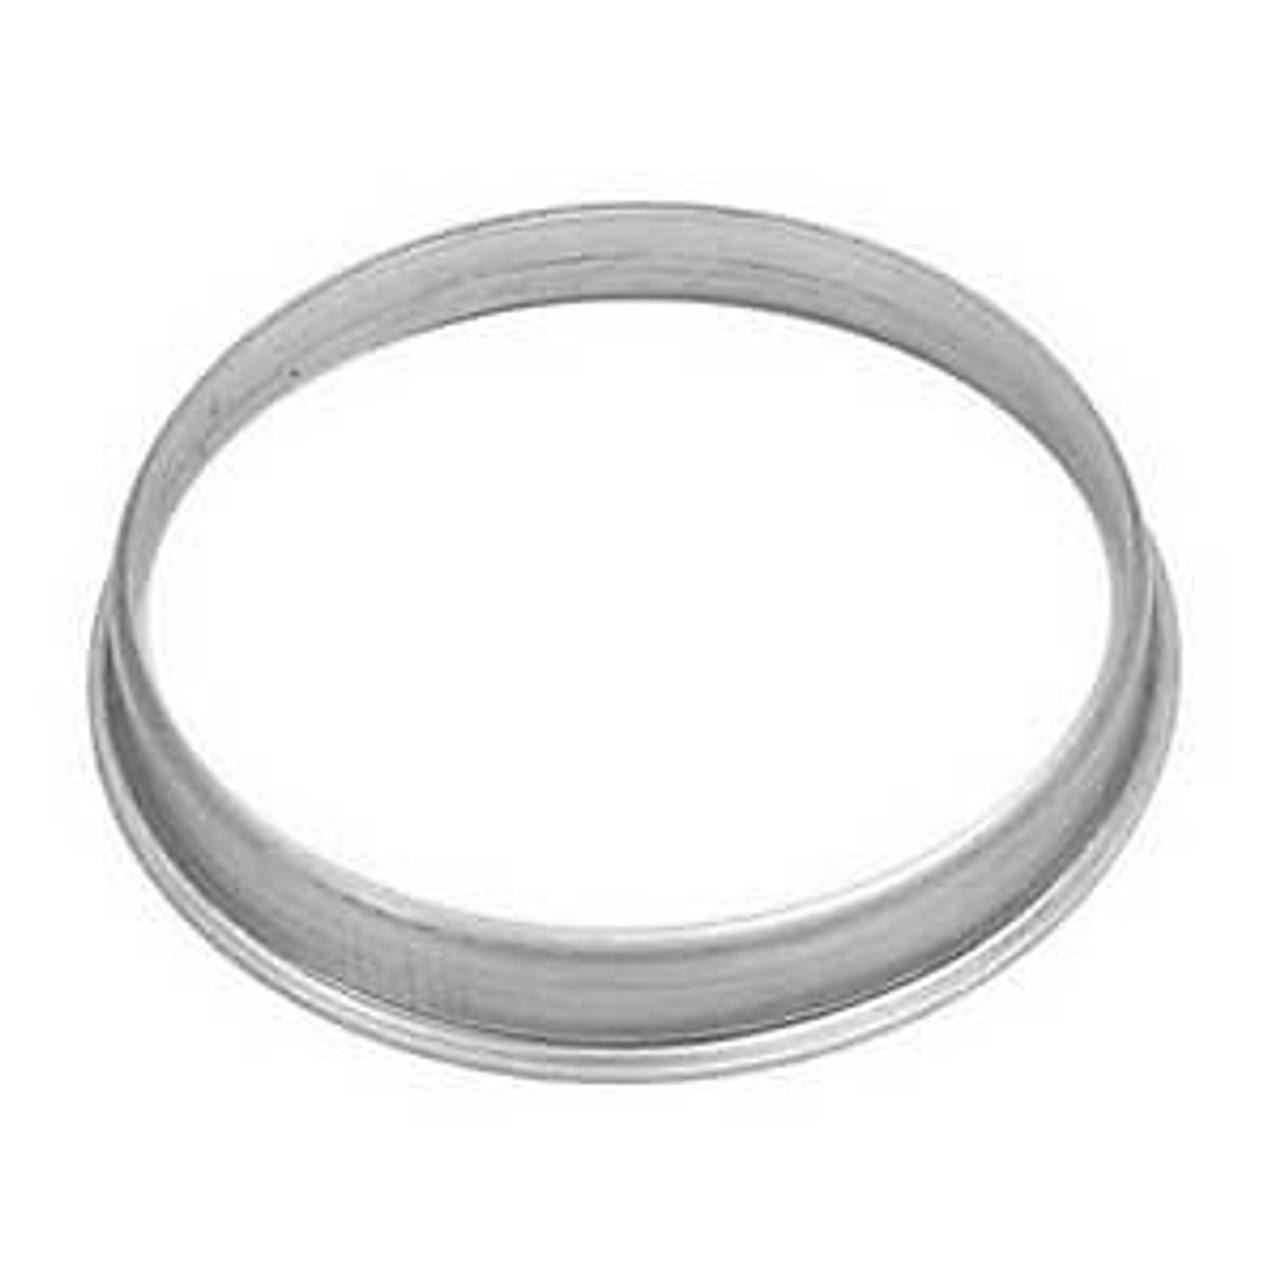 Bravo Replaces Mercruiser 91-818162 Bellow Retainer Ring Install tool Alpha